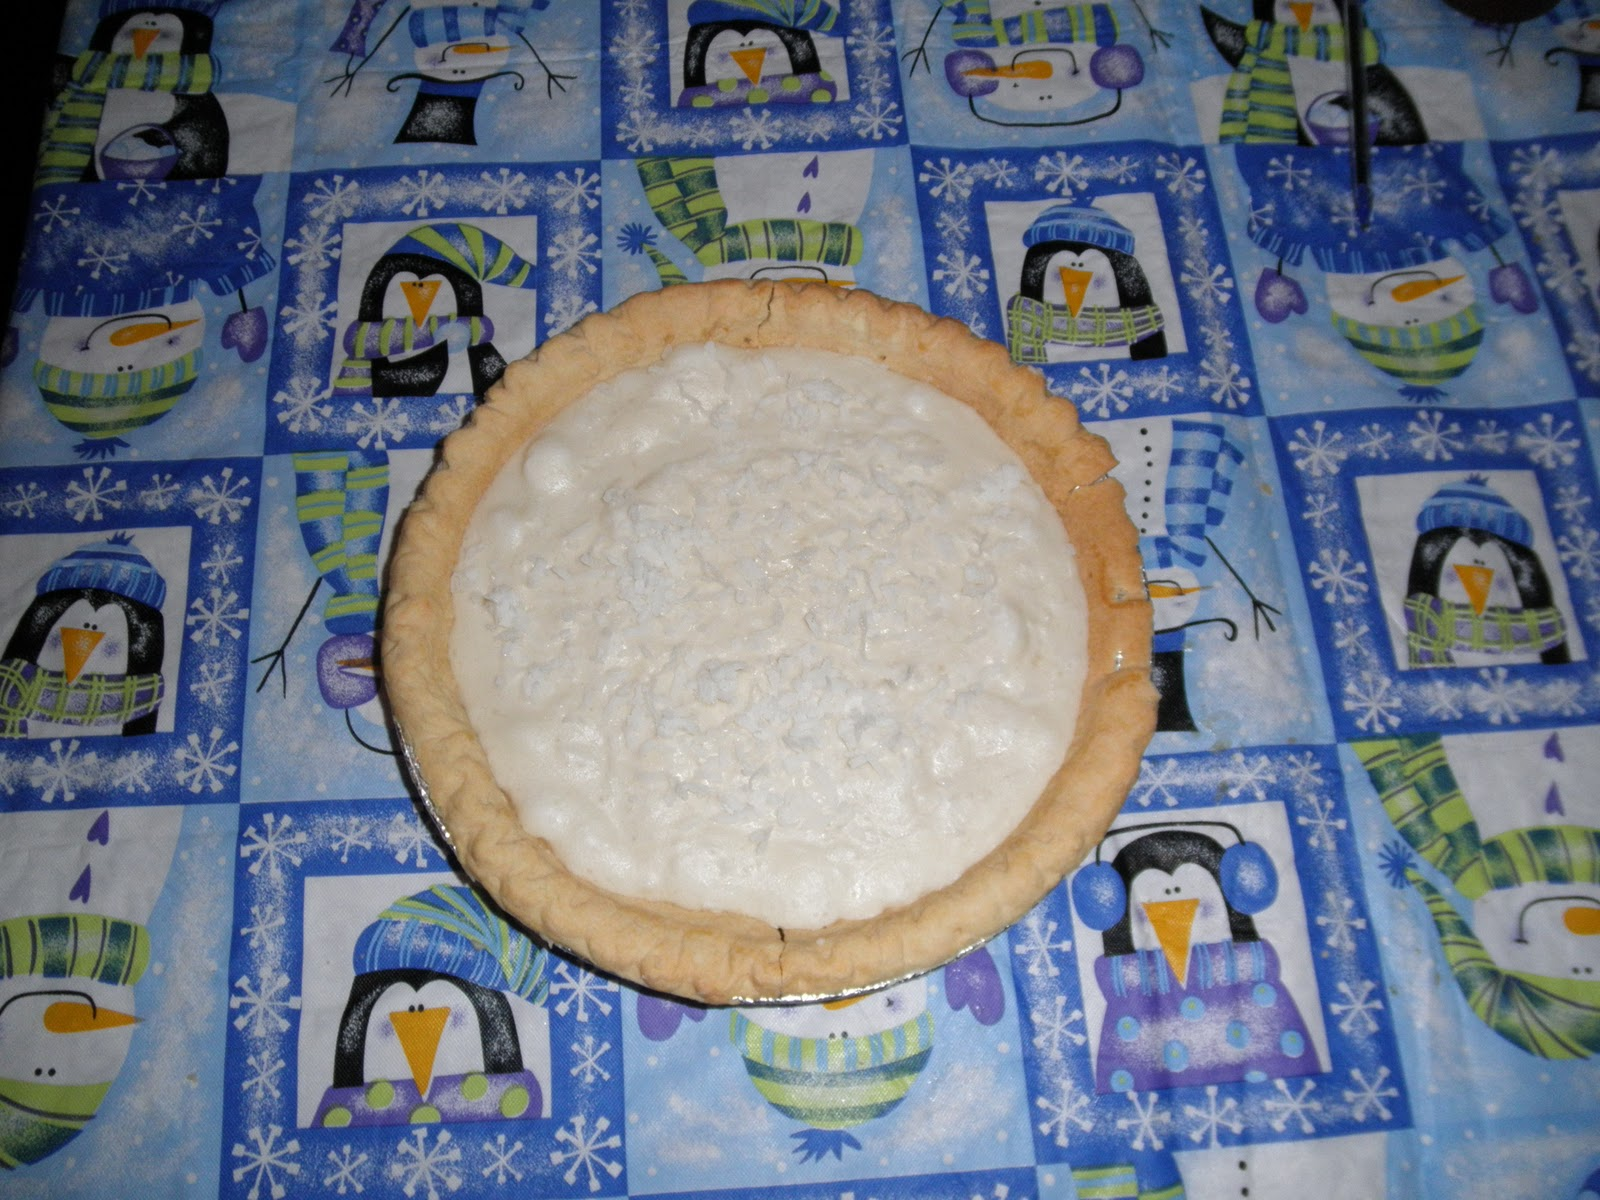 Missy's Homemaking Adventures: White Christmas Pie